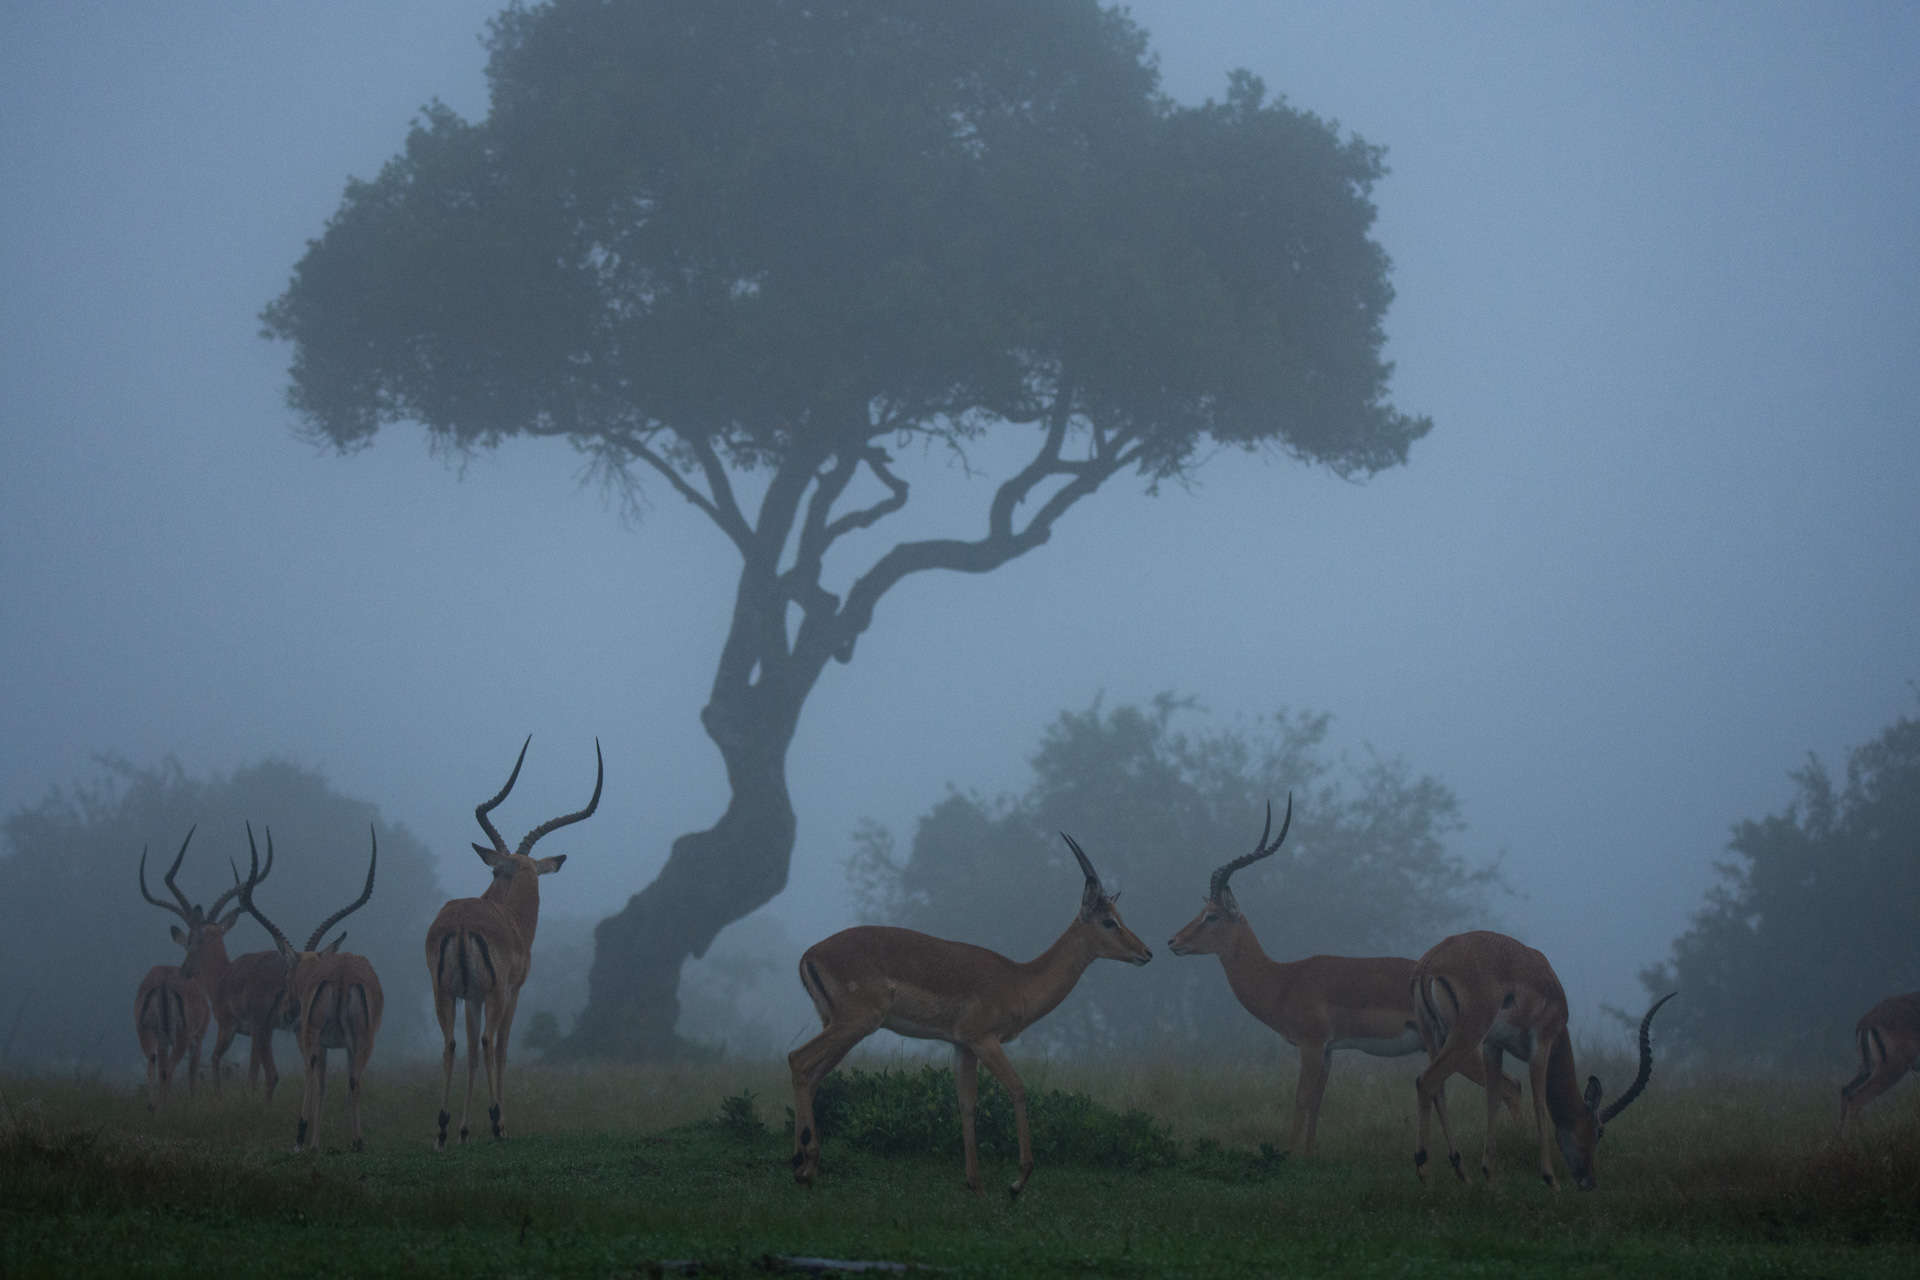 Impalas in the mist